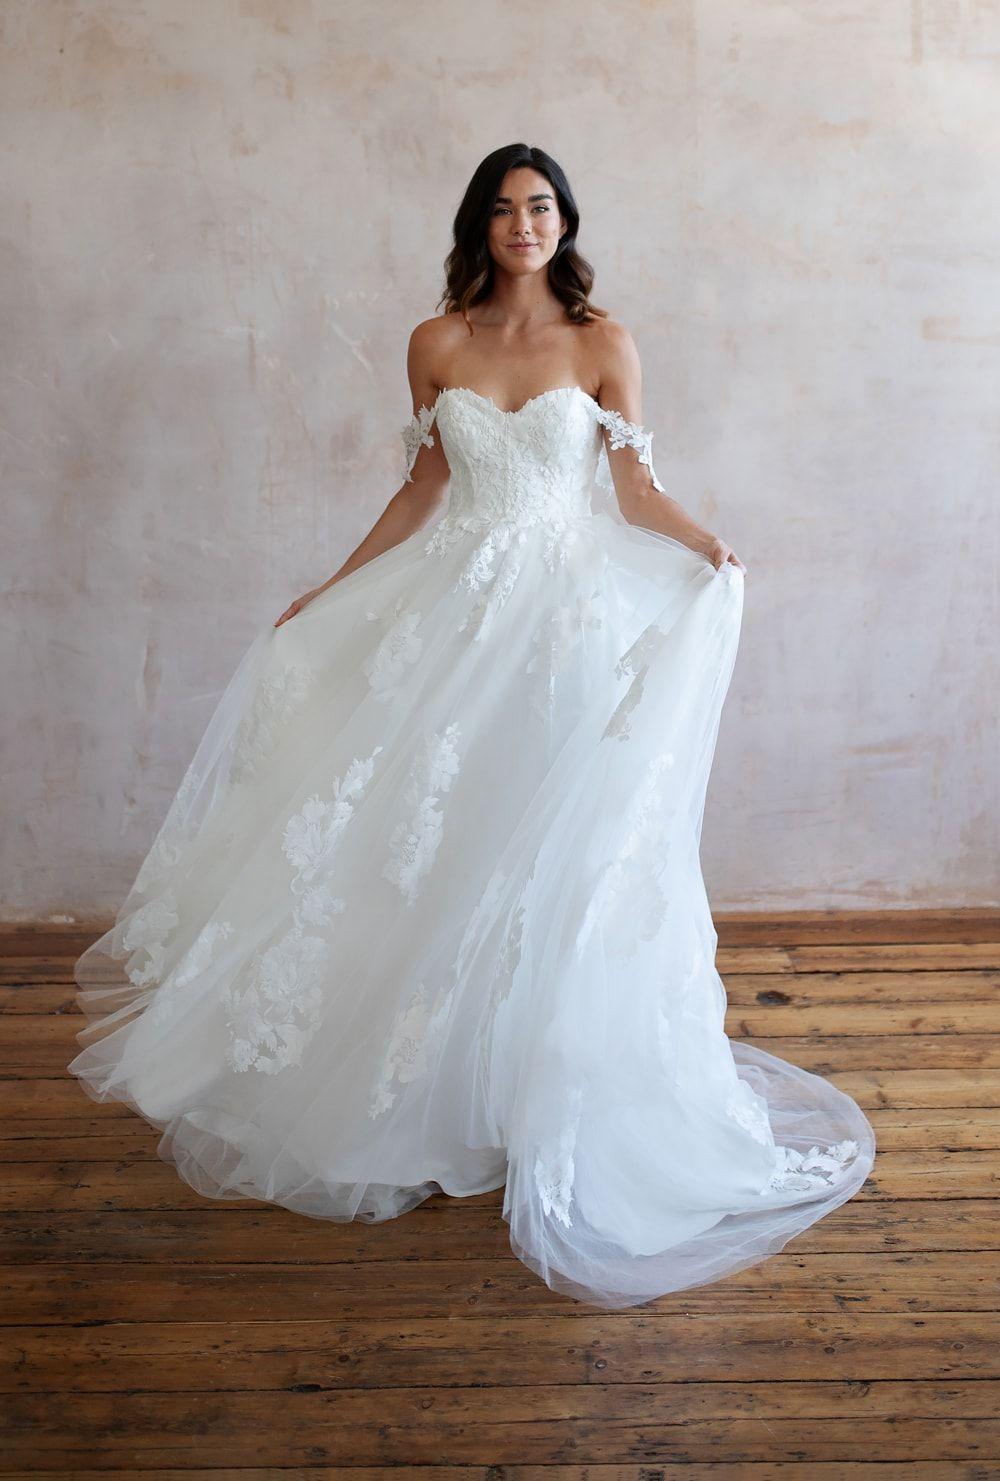 Bridal Shops Near Me Bridal Shops London Wedding Dresses Lace Lace Wedding Dresses Wedding Dress Lace Lace Wedding Dress Wedding Dresses Boho Wedding Dress 9 9